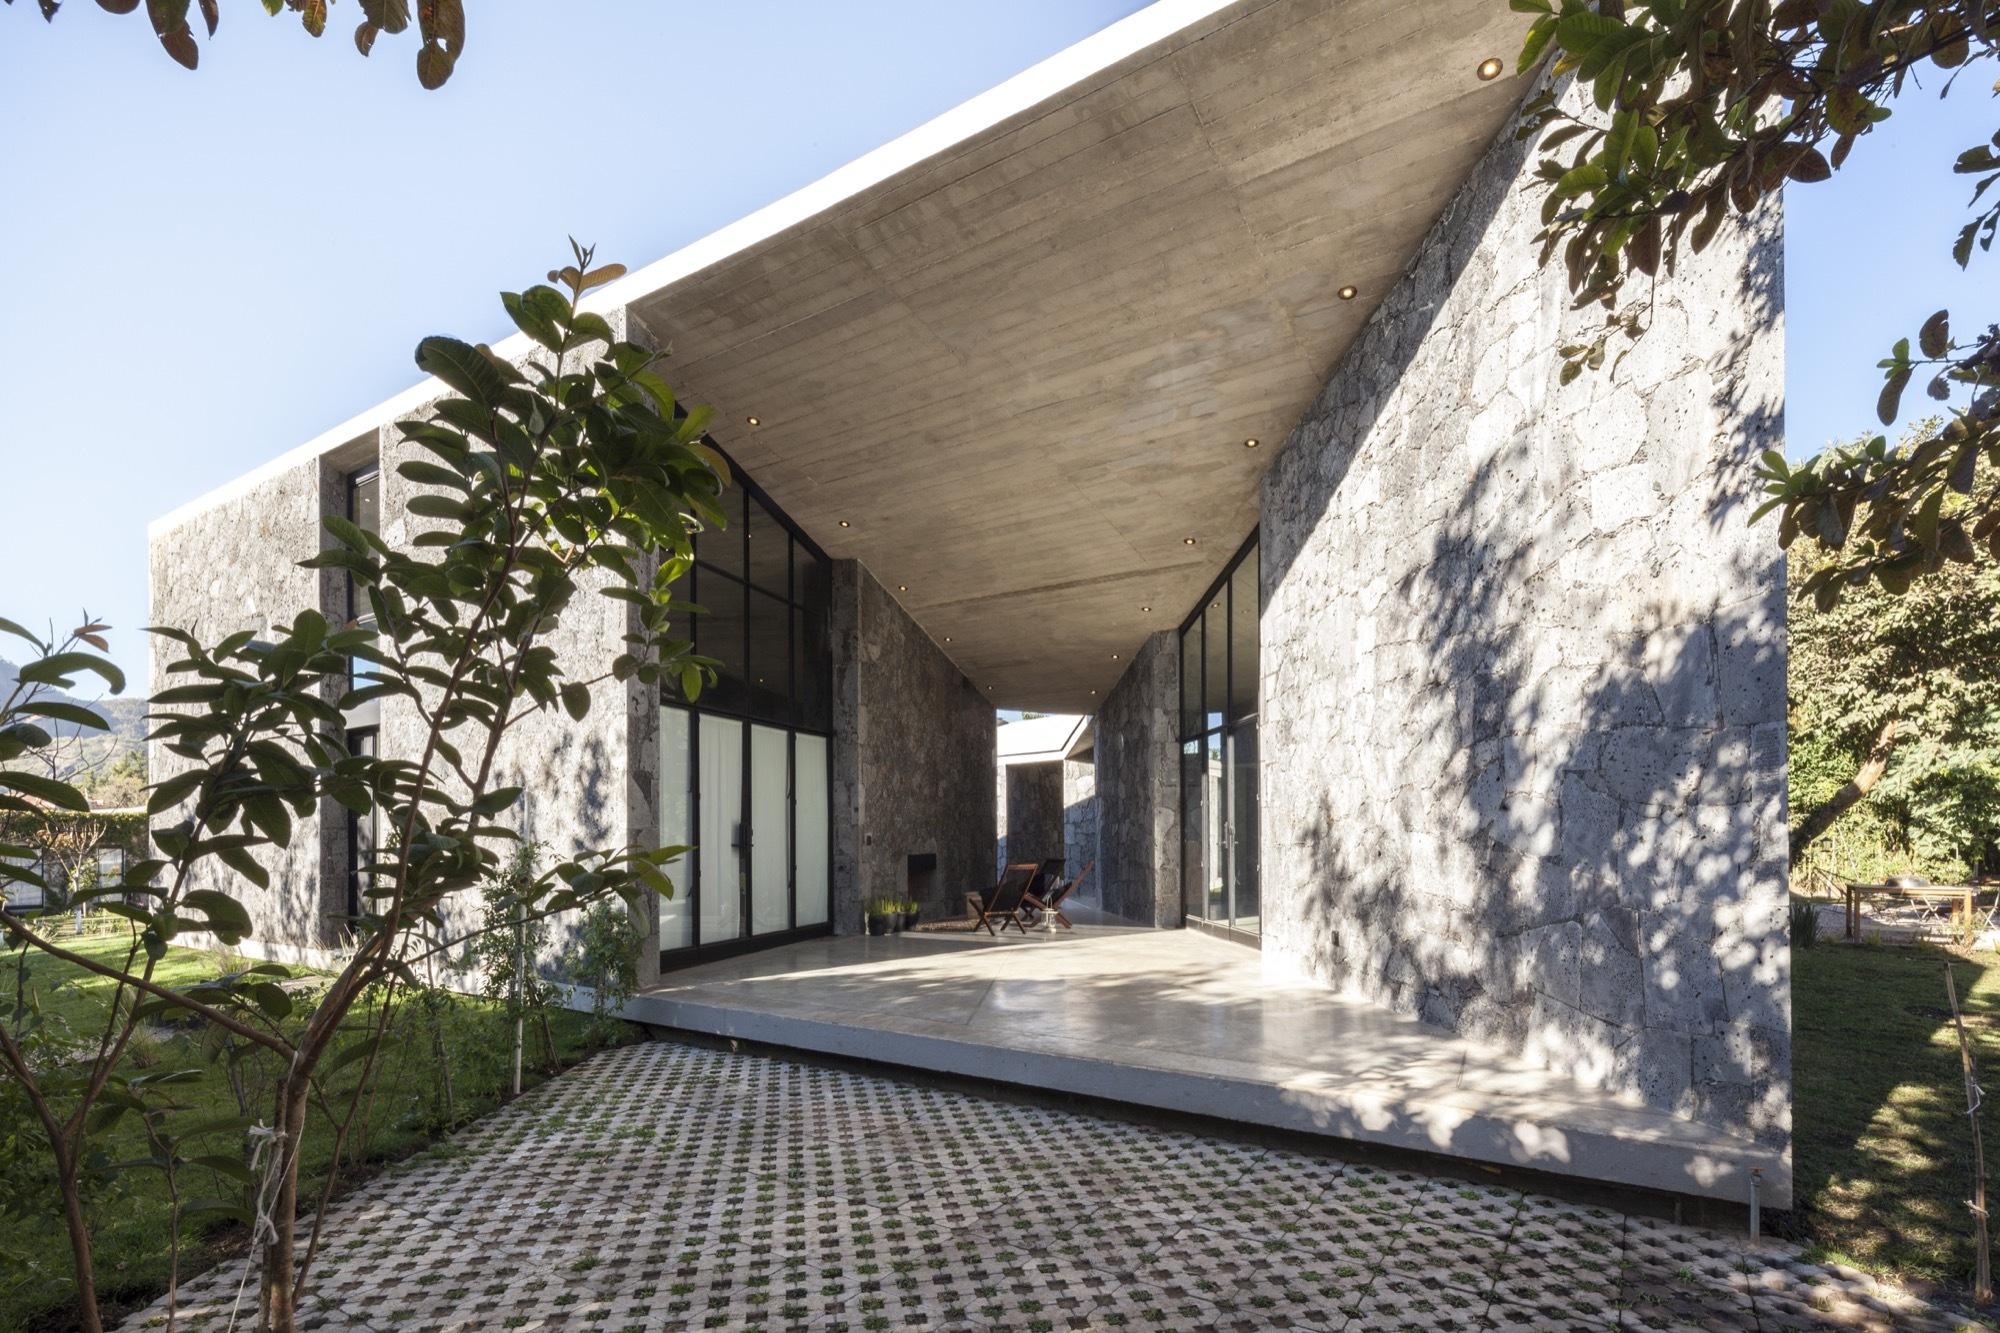 MA House / Cadaval & Solà-Morales   ArchDaily